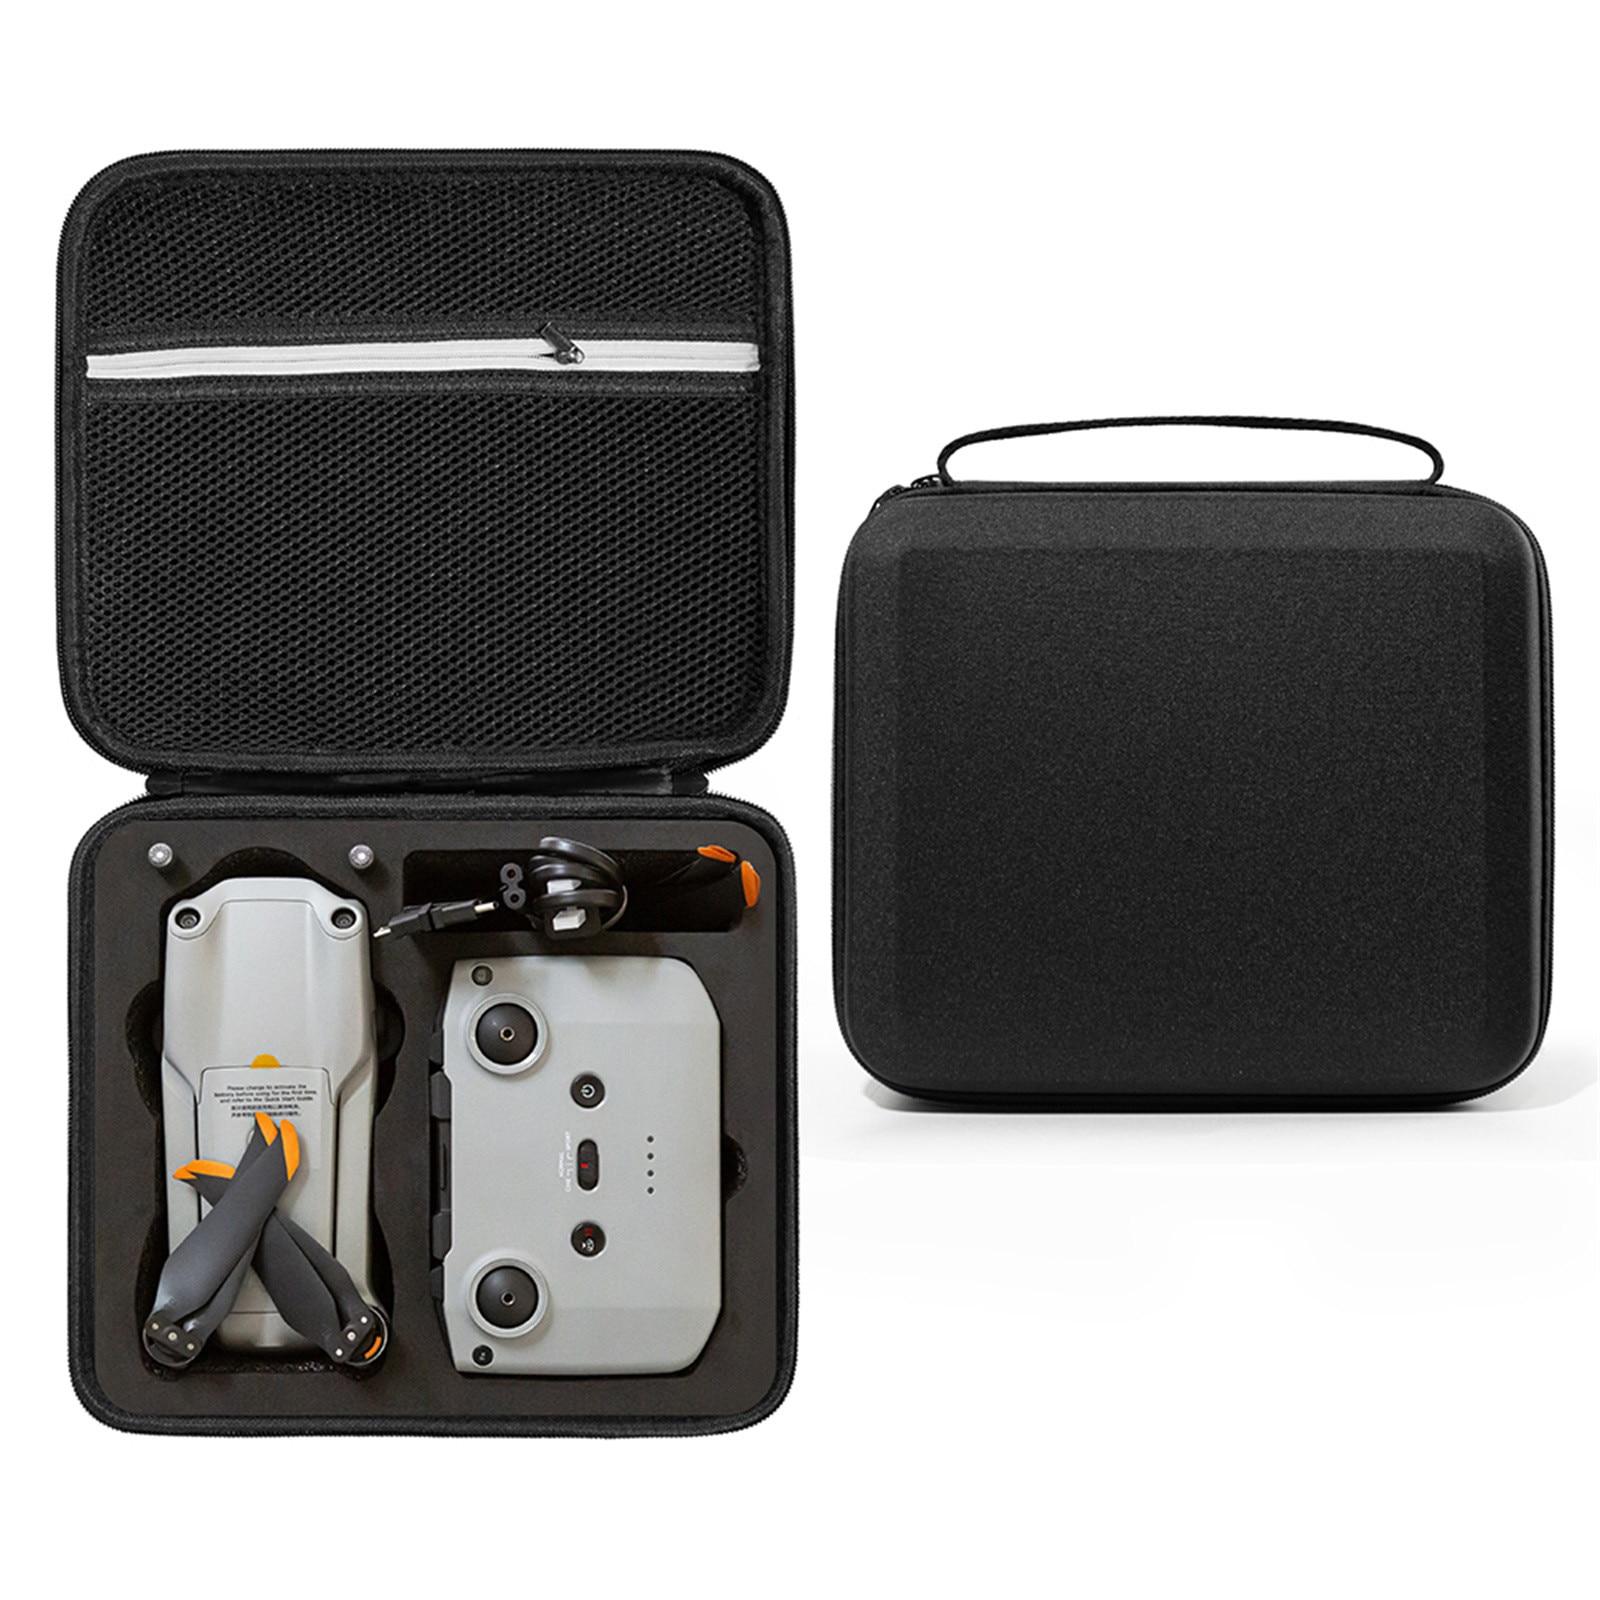 Storage Box For Dji Mavic Air 2/2s Rc Drone Carrying Case Travel Handbag Hard Shell Portable Drone Storage Case